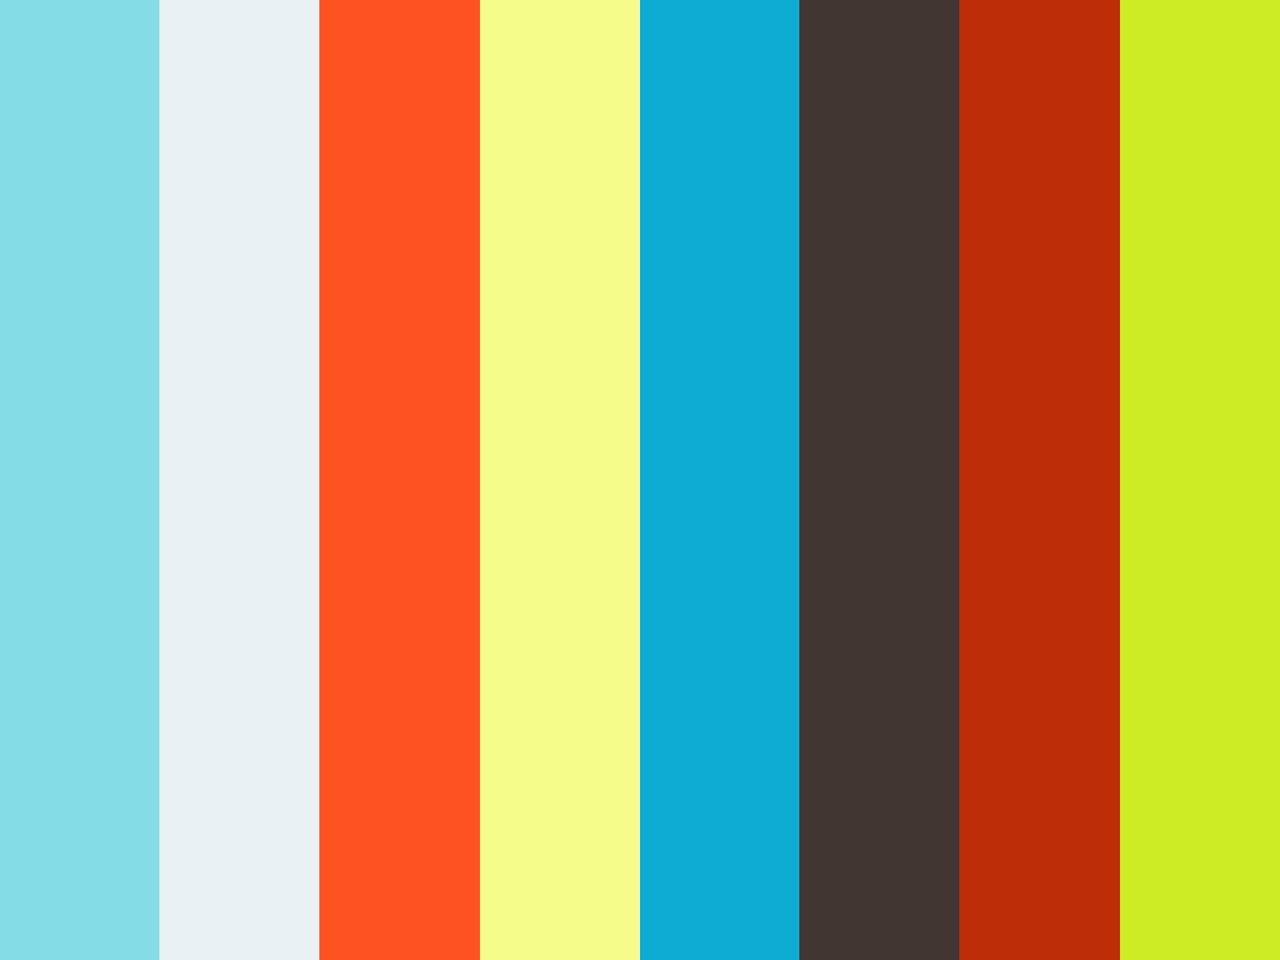 170909 CARONNESE-BRA 2-1 - INT DAIDOLA